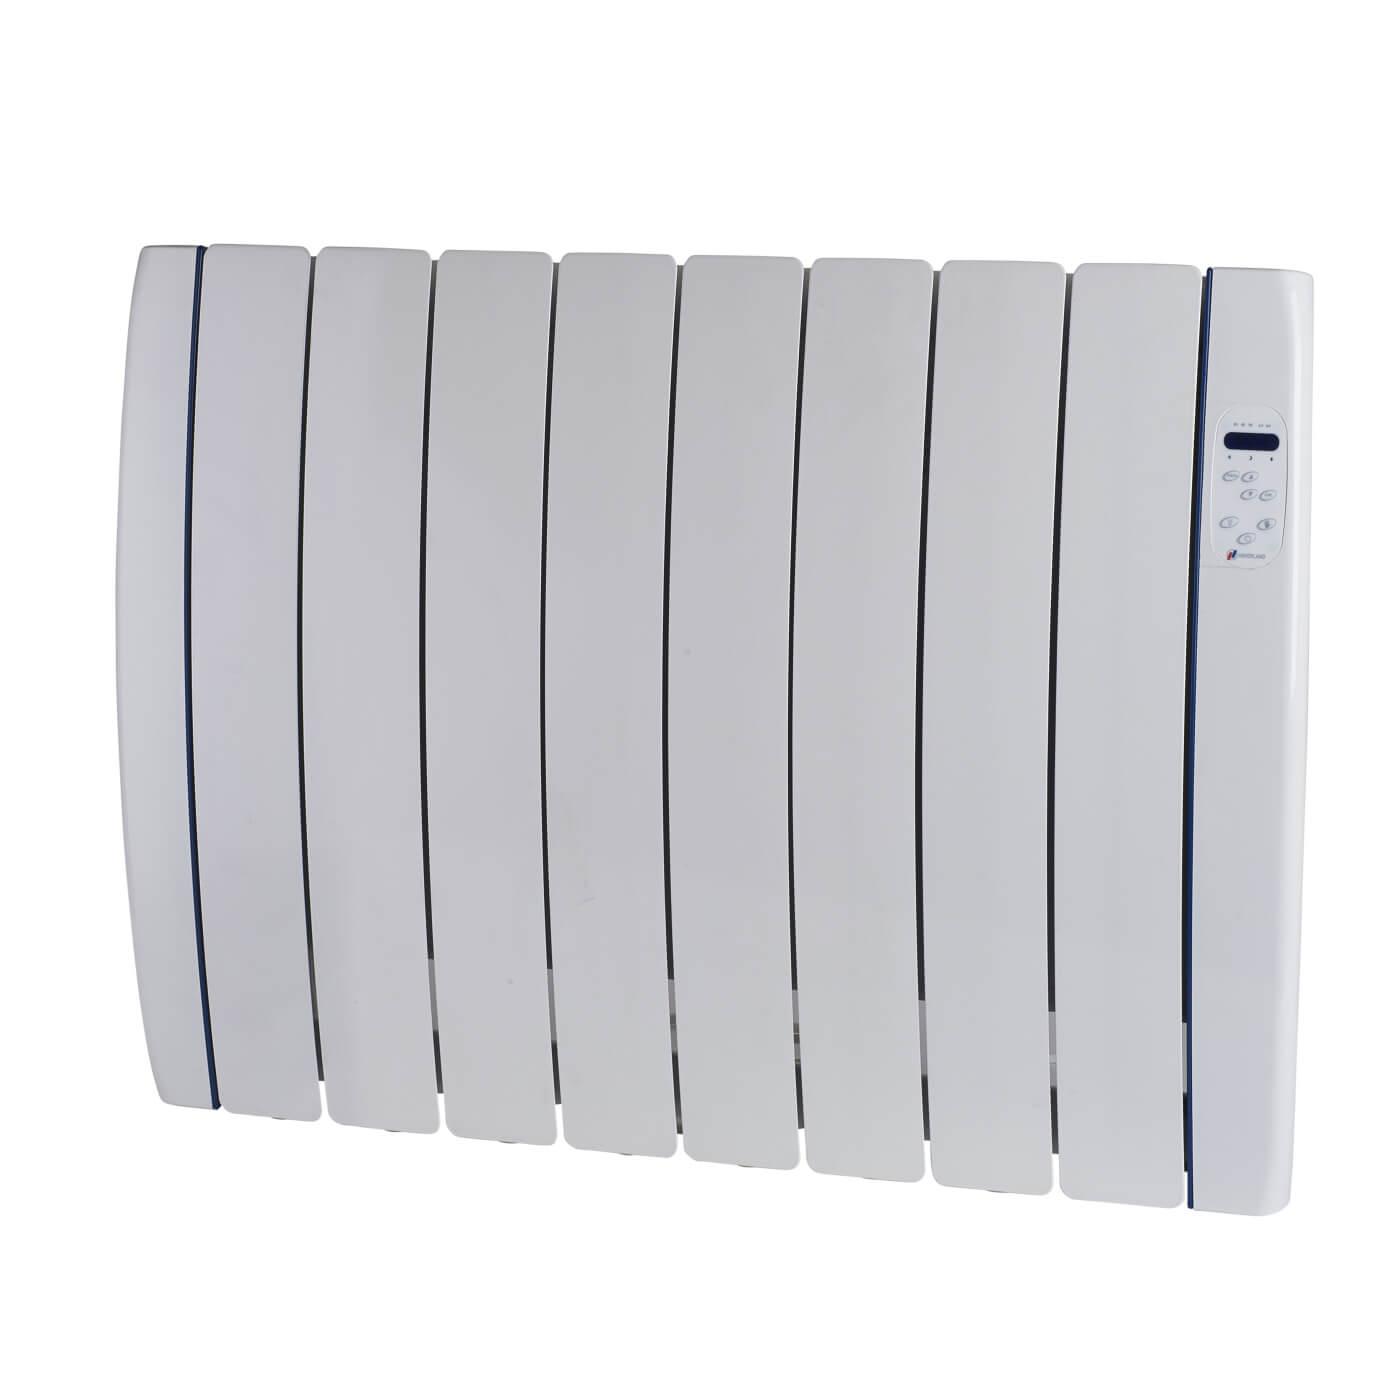 Haverland 1000w 8 Element Electric Radiator Electricaldirect 610w Telephone Wall Socket Wiring Back